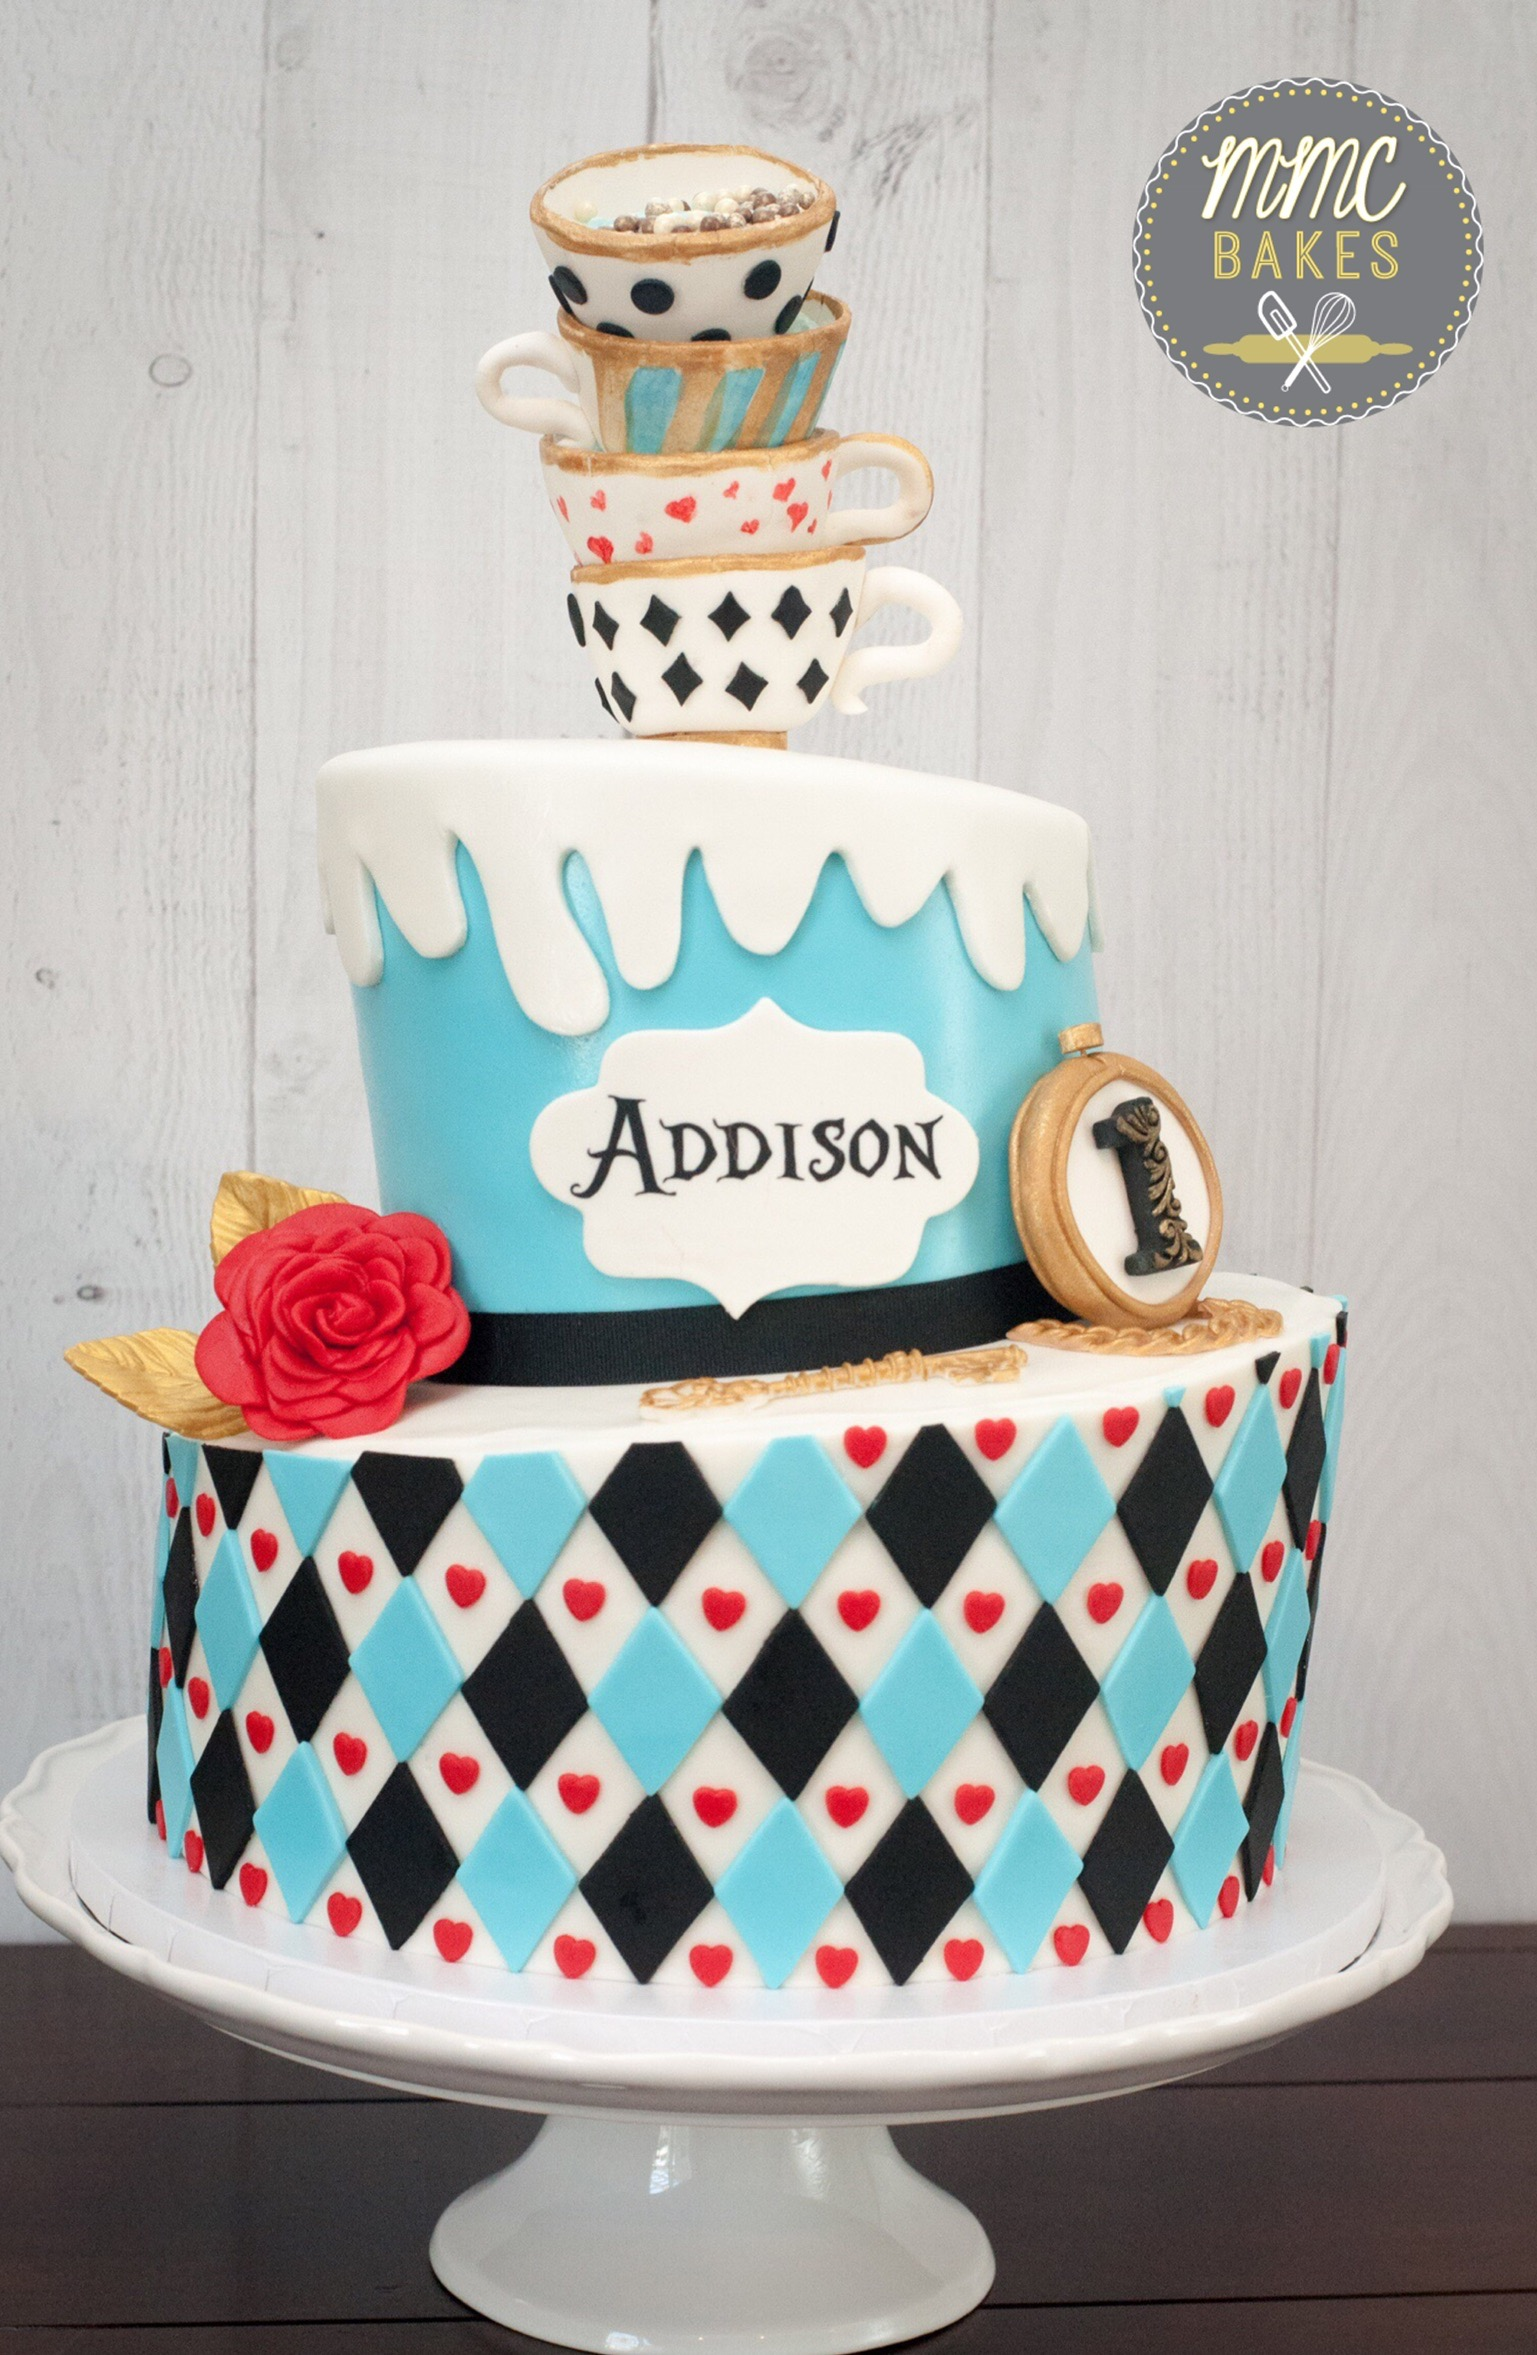 Alice In Wonderland Cake Mmc Bakes